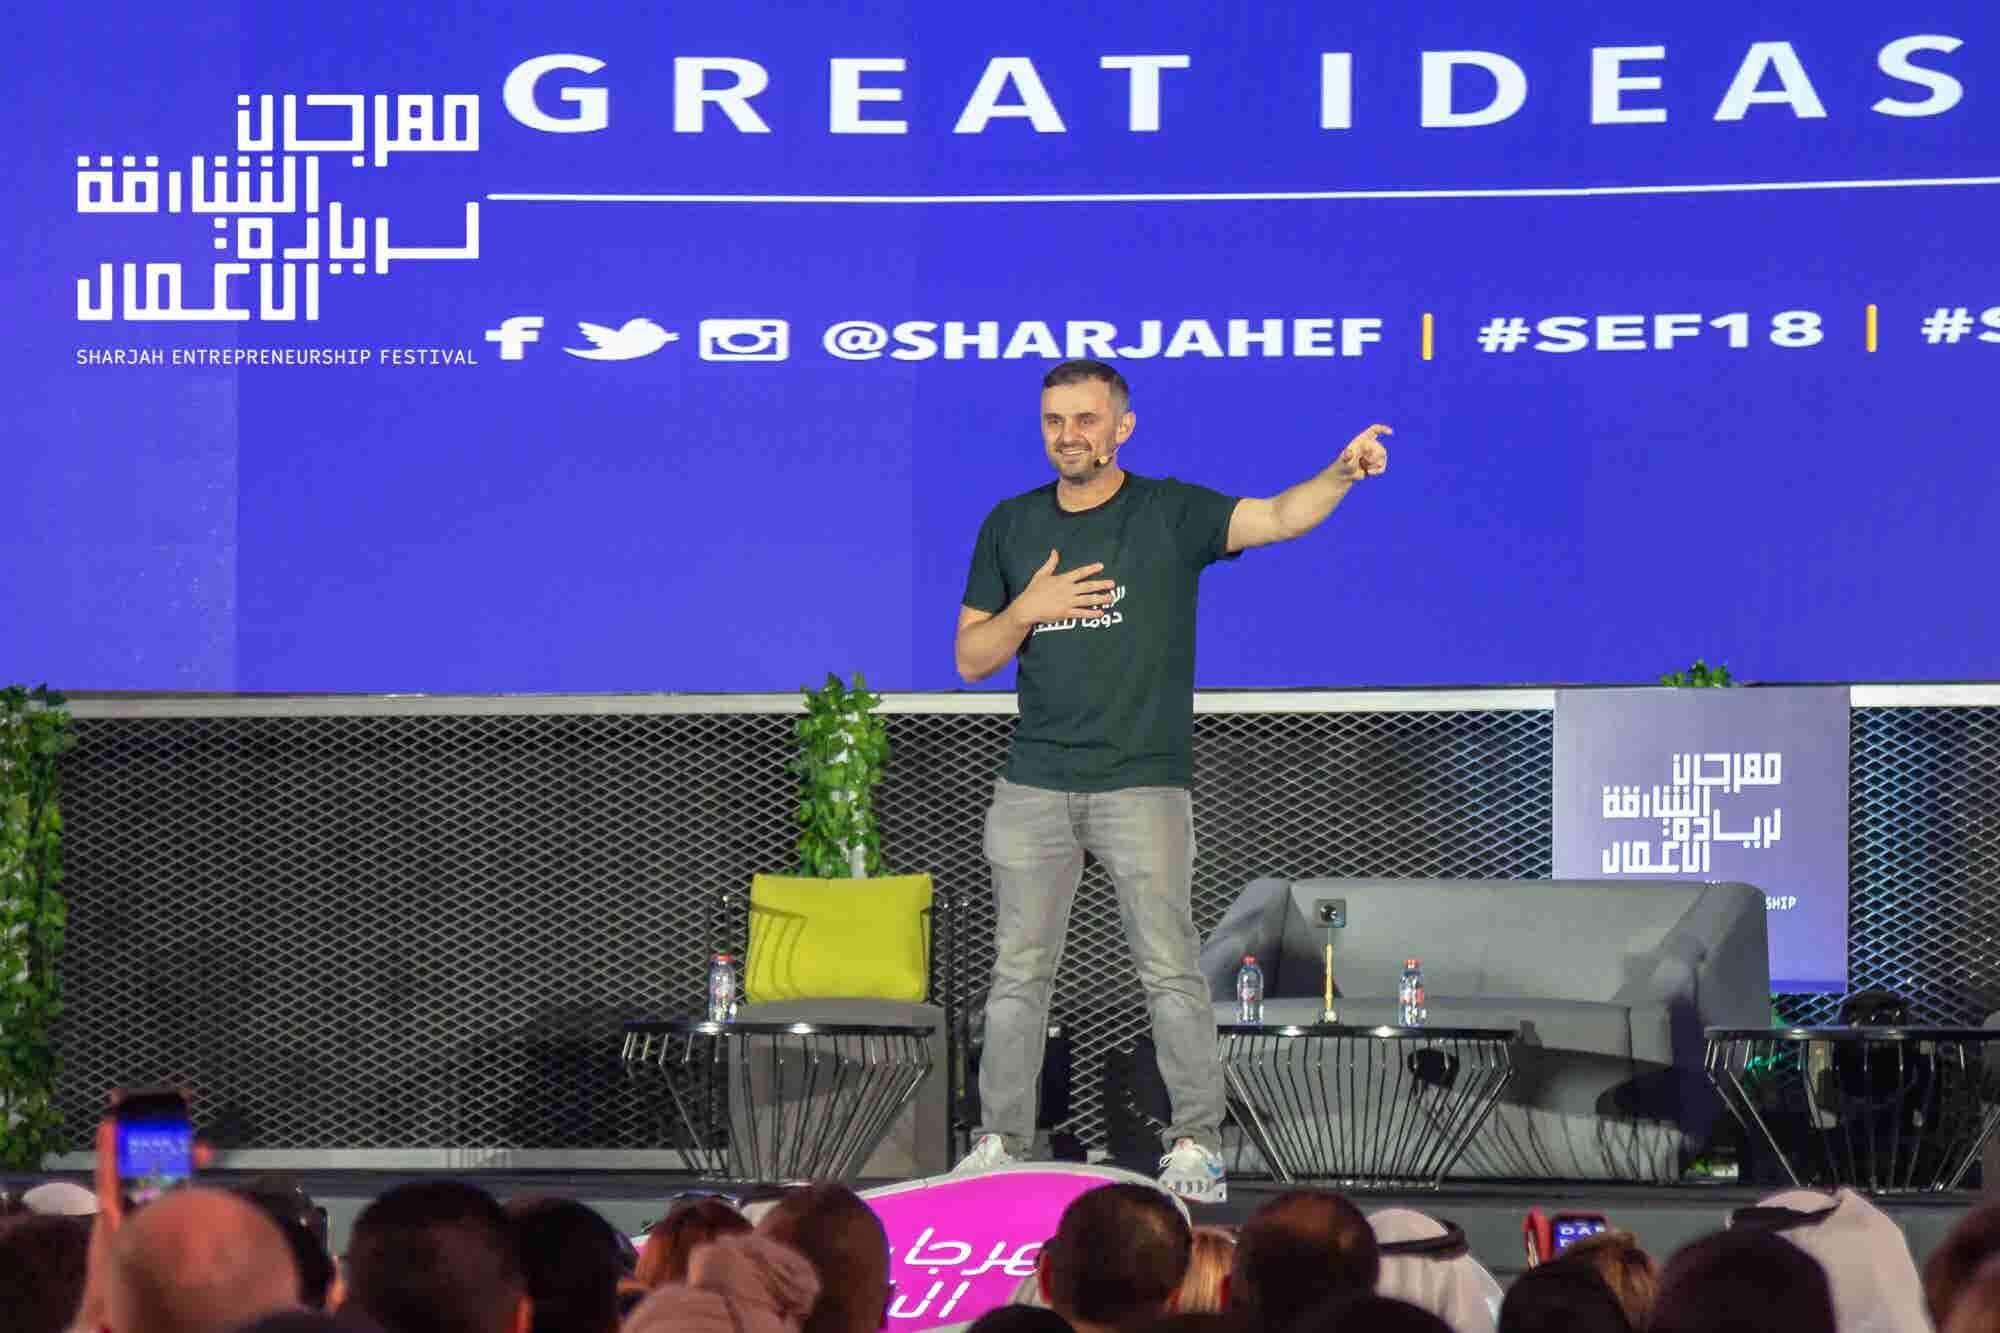 Stepping Up: Serial Entrepreneur Gary Vaynerchuk